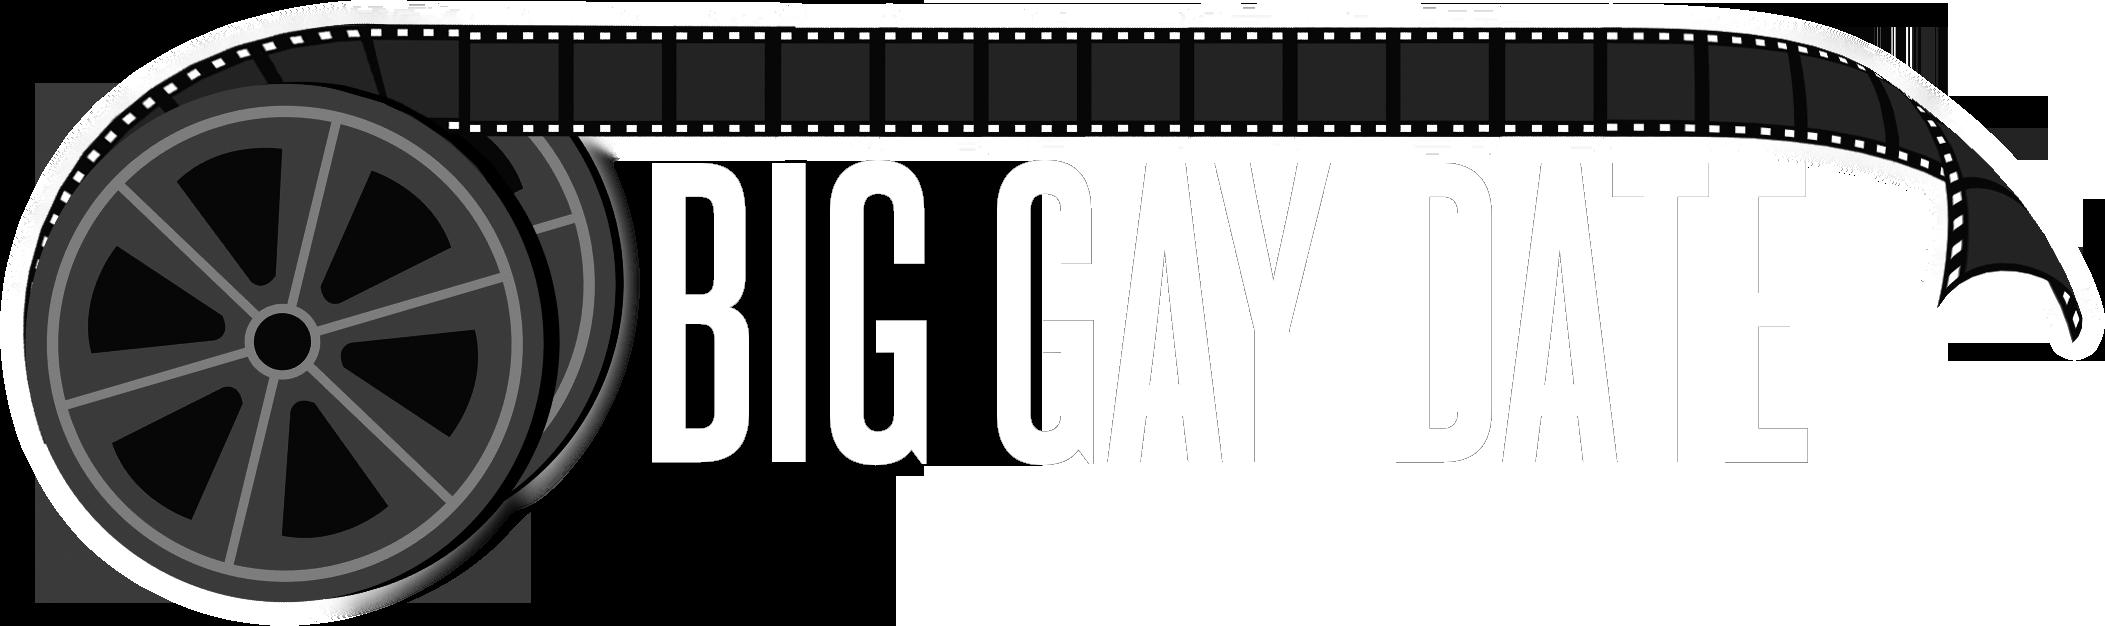 Big Gay Date